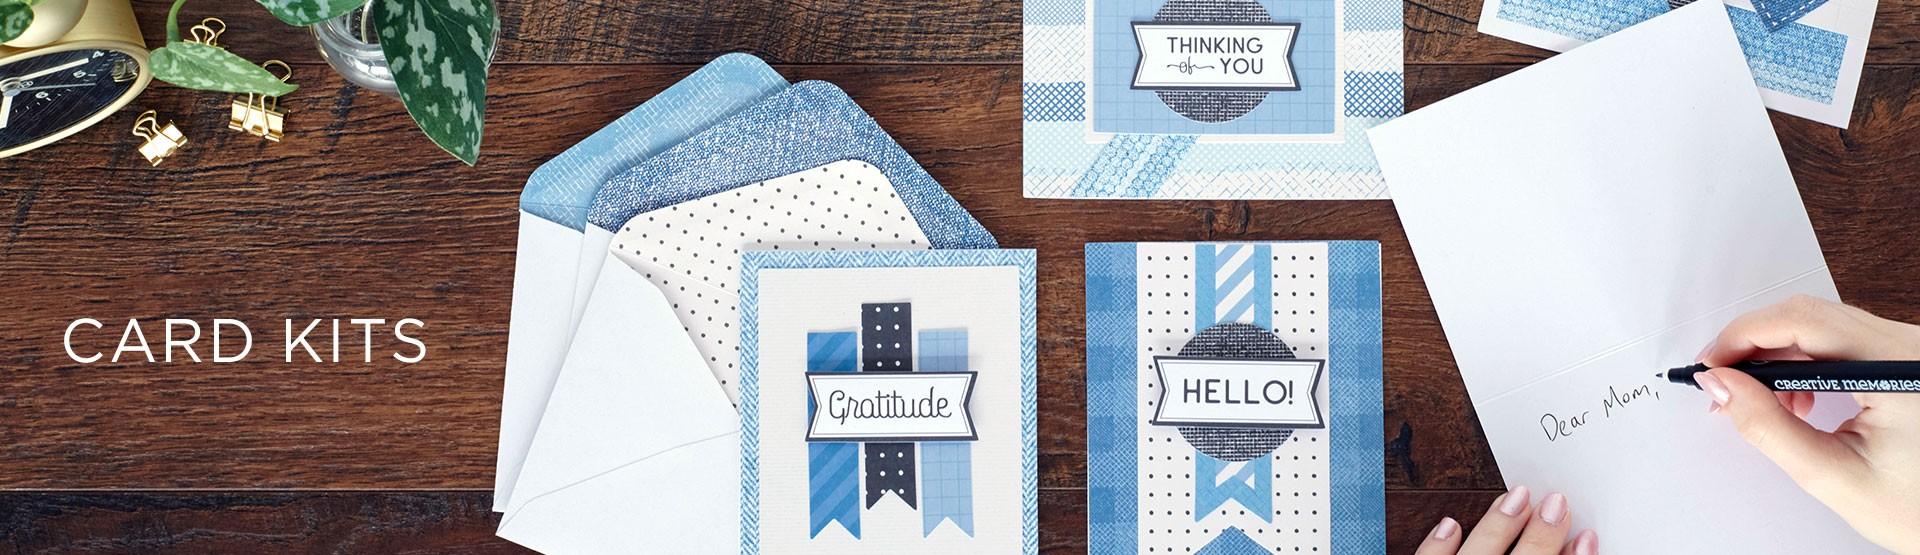 Card Kits